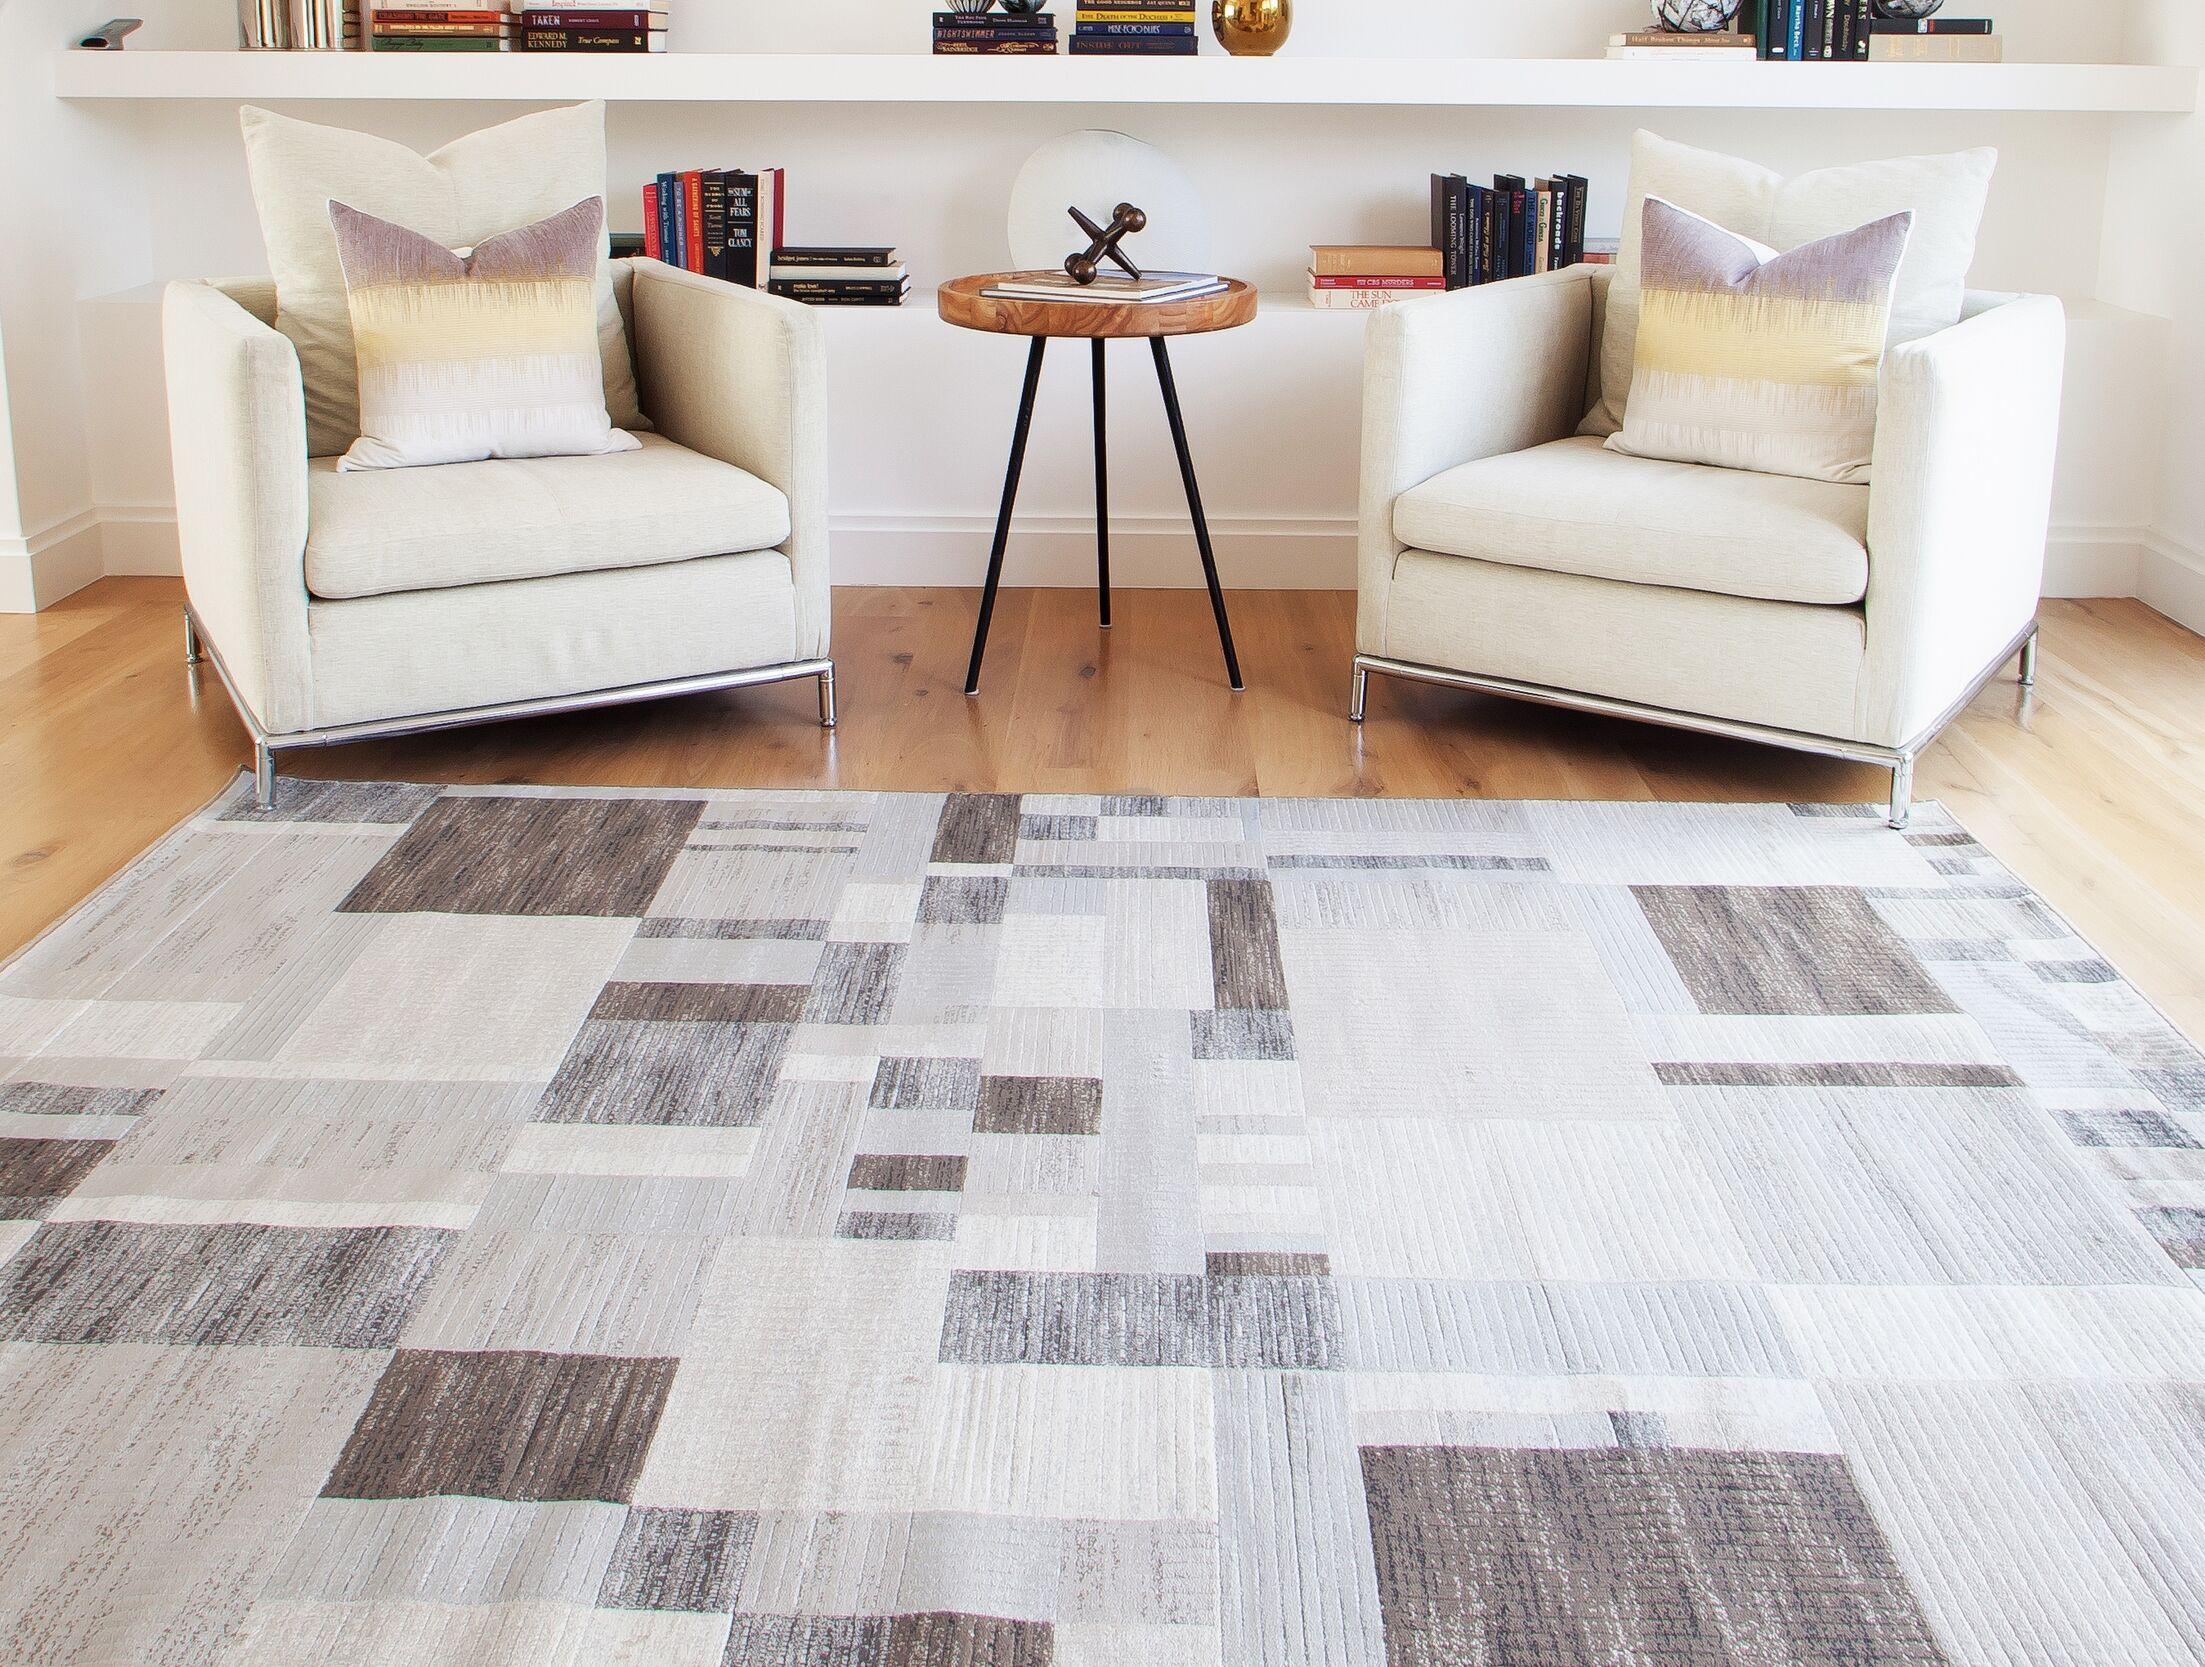 Glencoe Charcoal/Ivory/Grey Area Rug Rug Size: 7'10